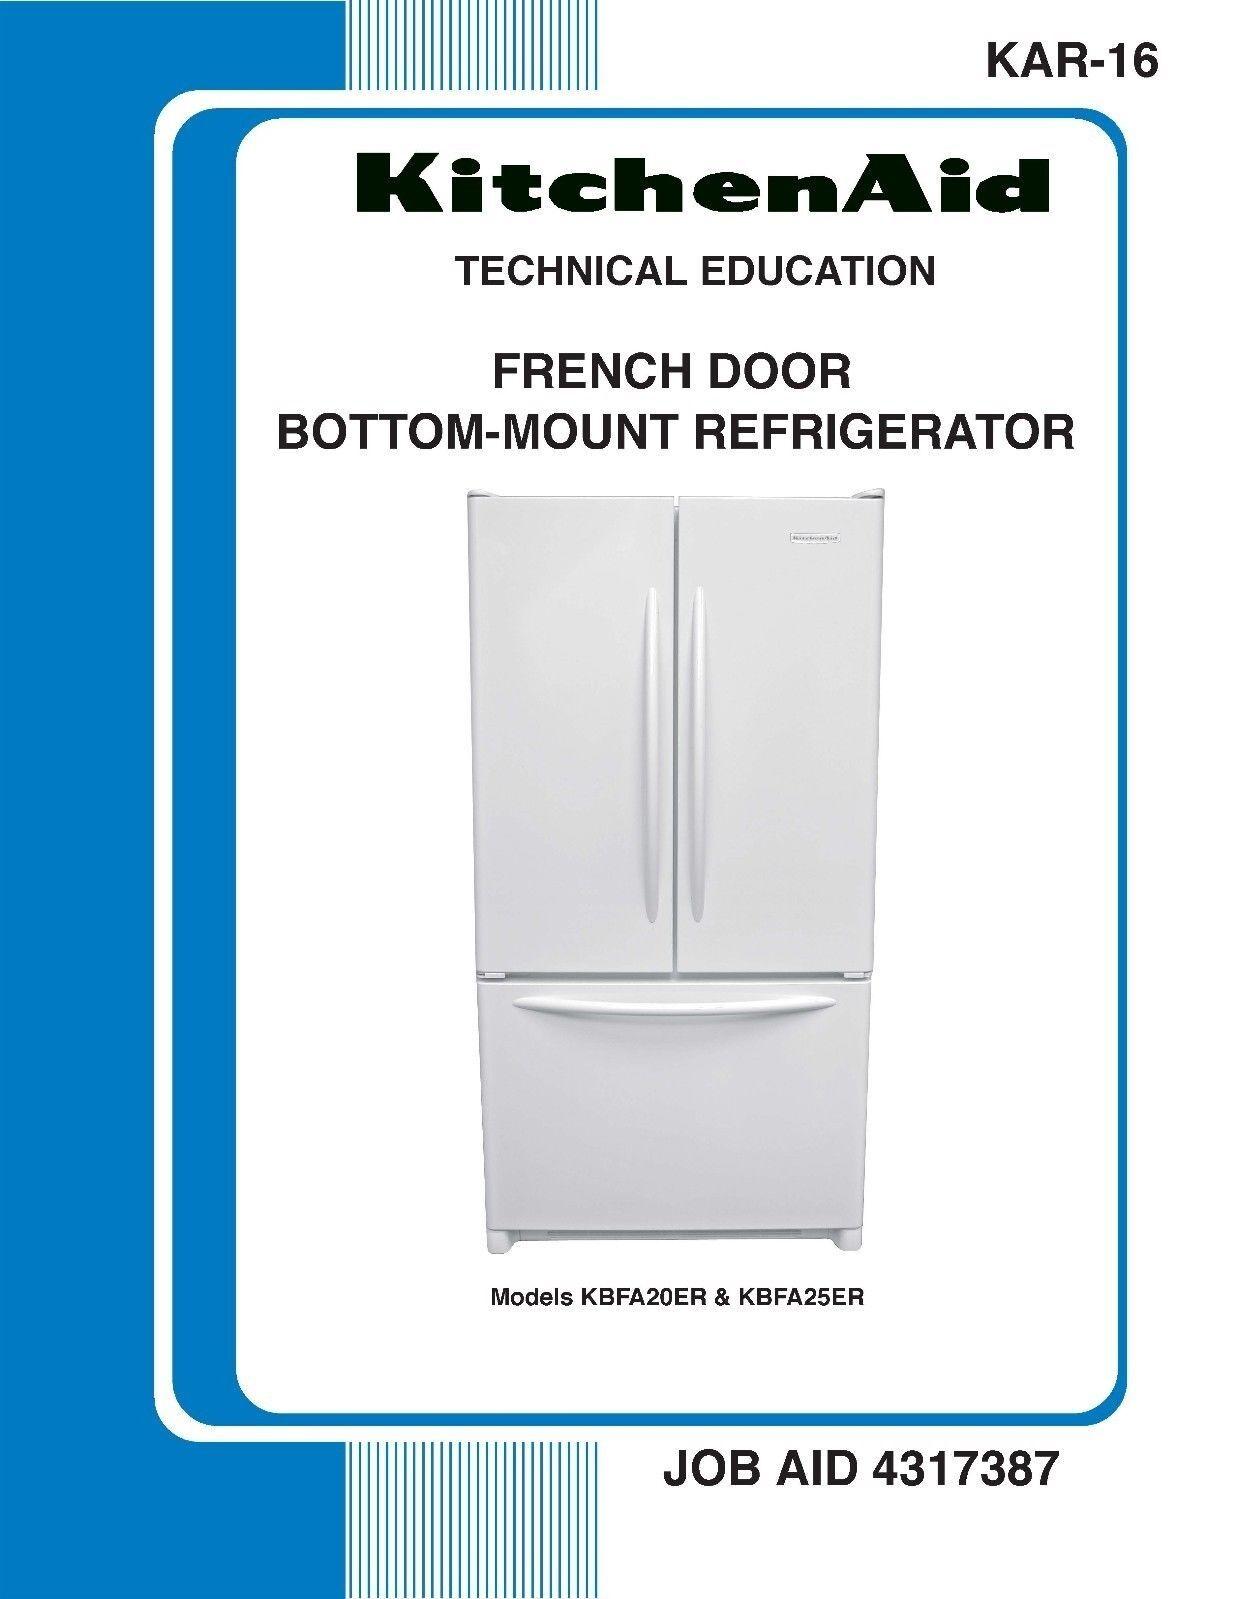 Kitchenaid Fridge Service Manual - Kitchen Design